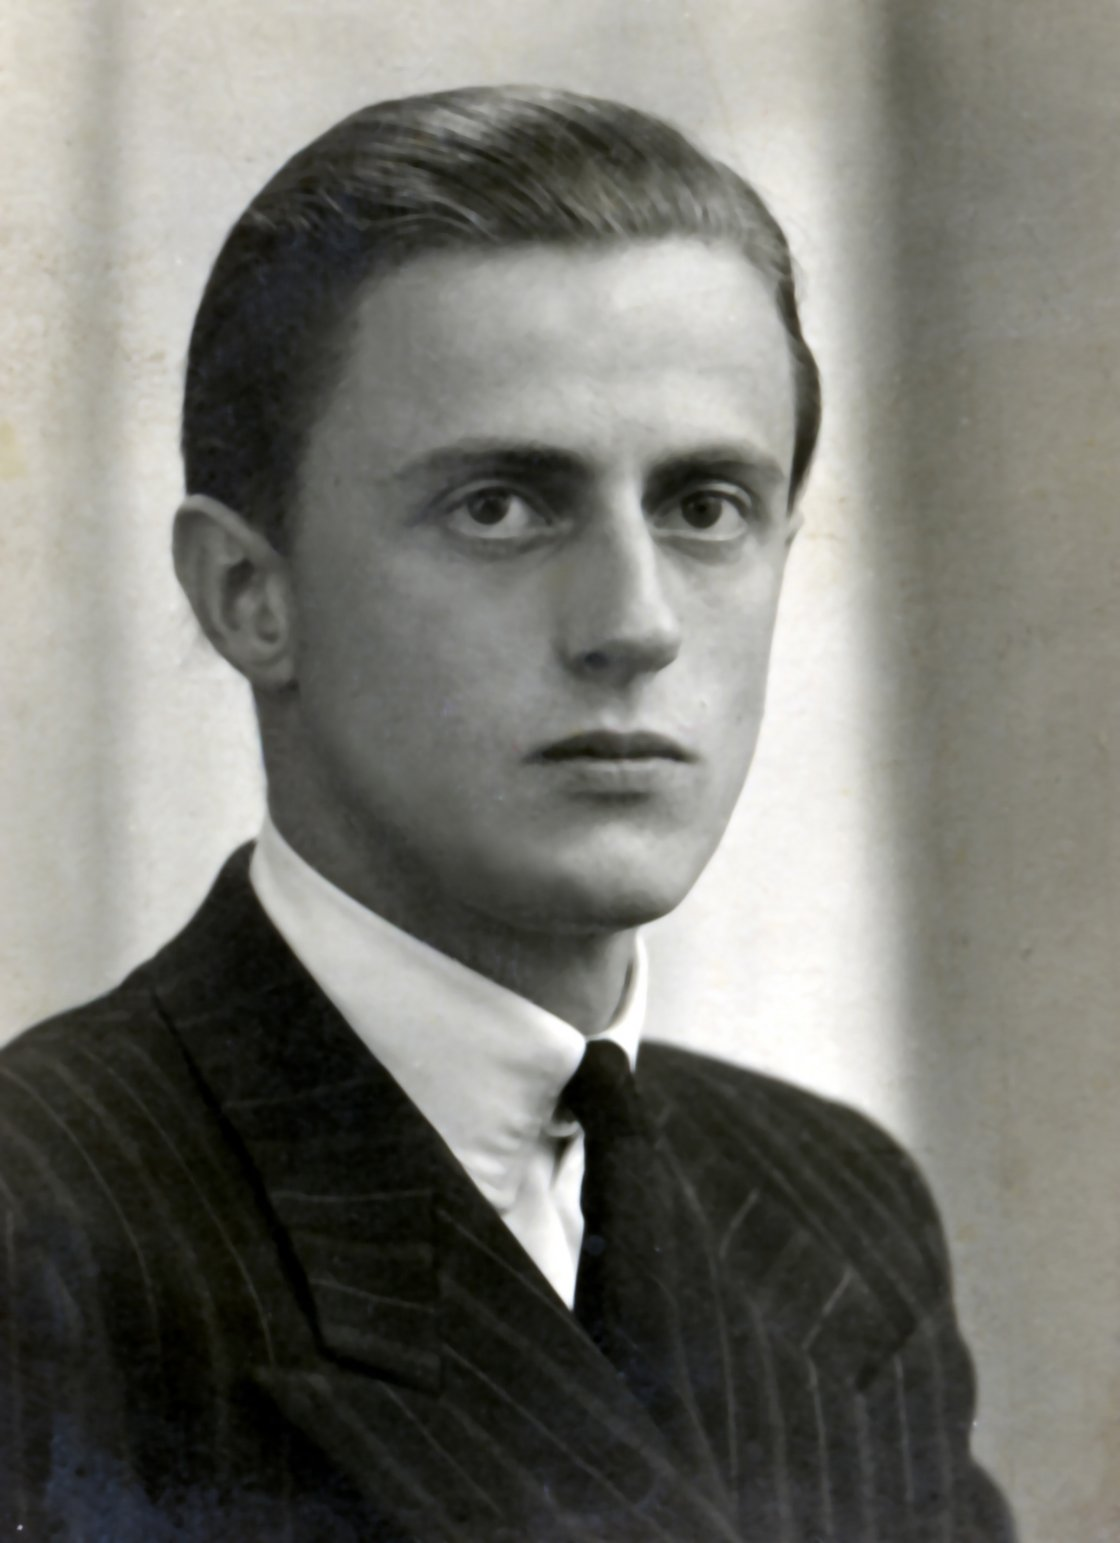 retrato-del-baron-hans-heinrich-thyssen-bornemisza-1938.jpg